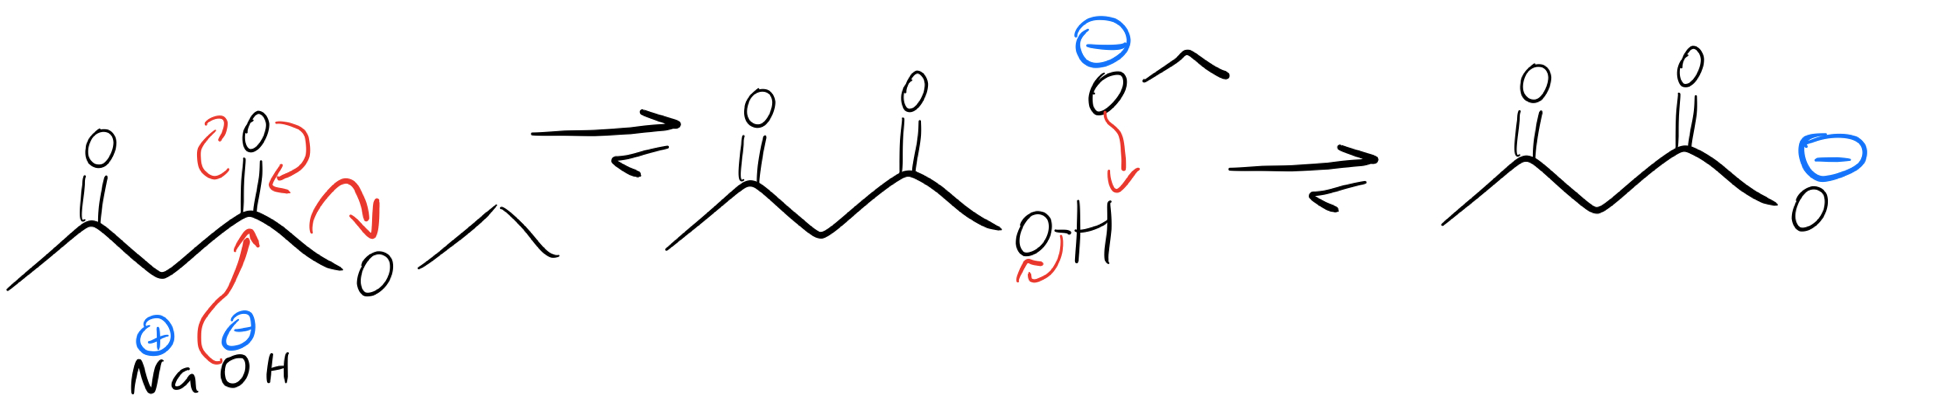 abridged-saponification-mechanism